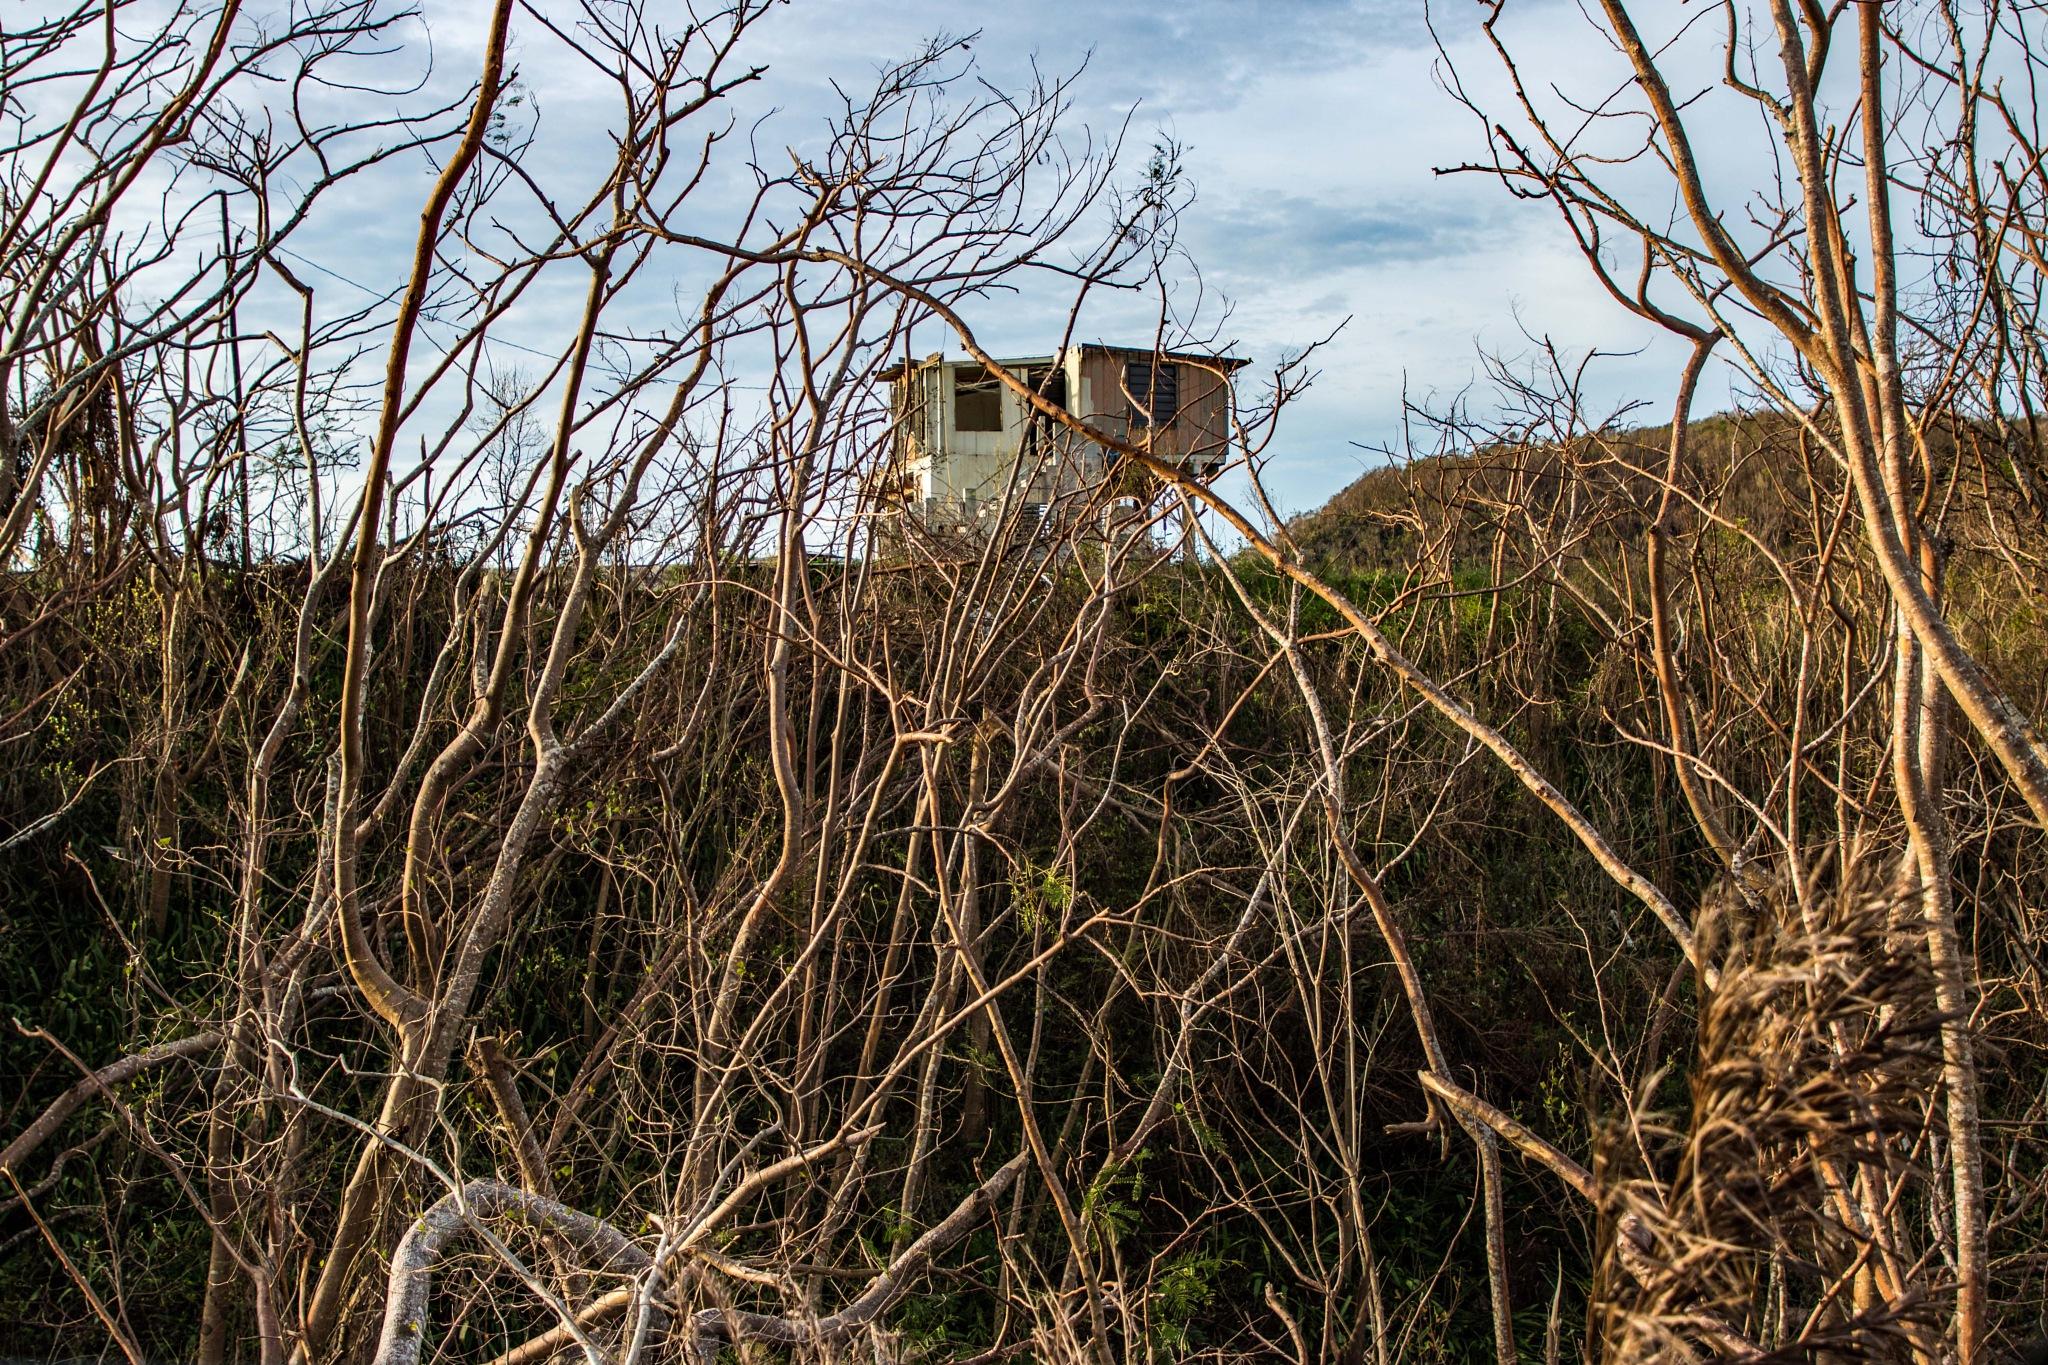 Hurricane Maria by Vanessa R Lazzarini